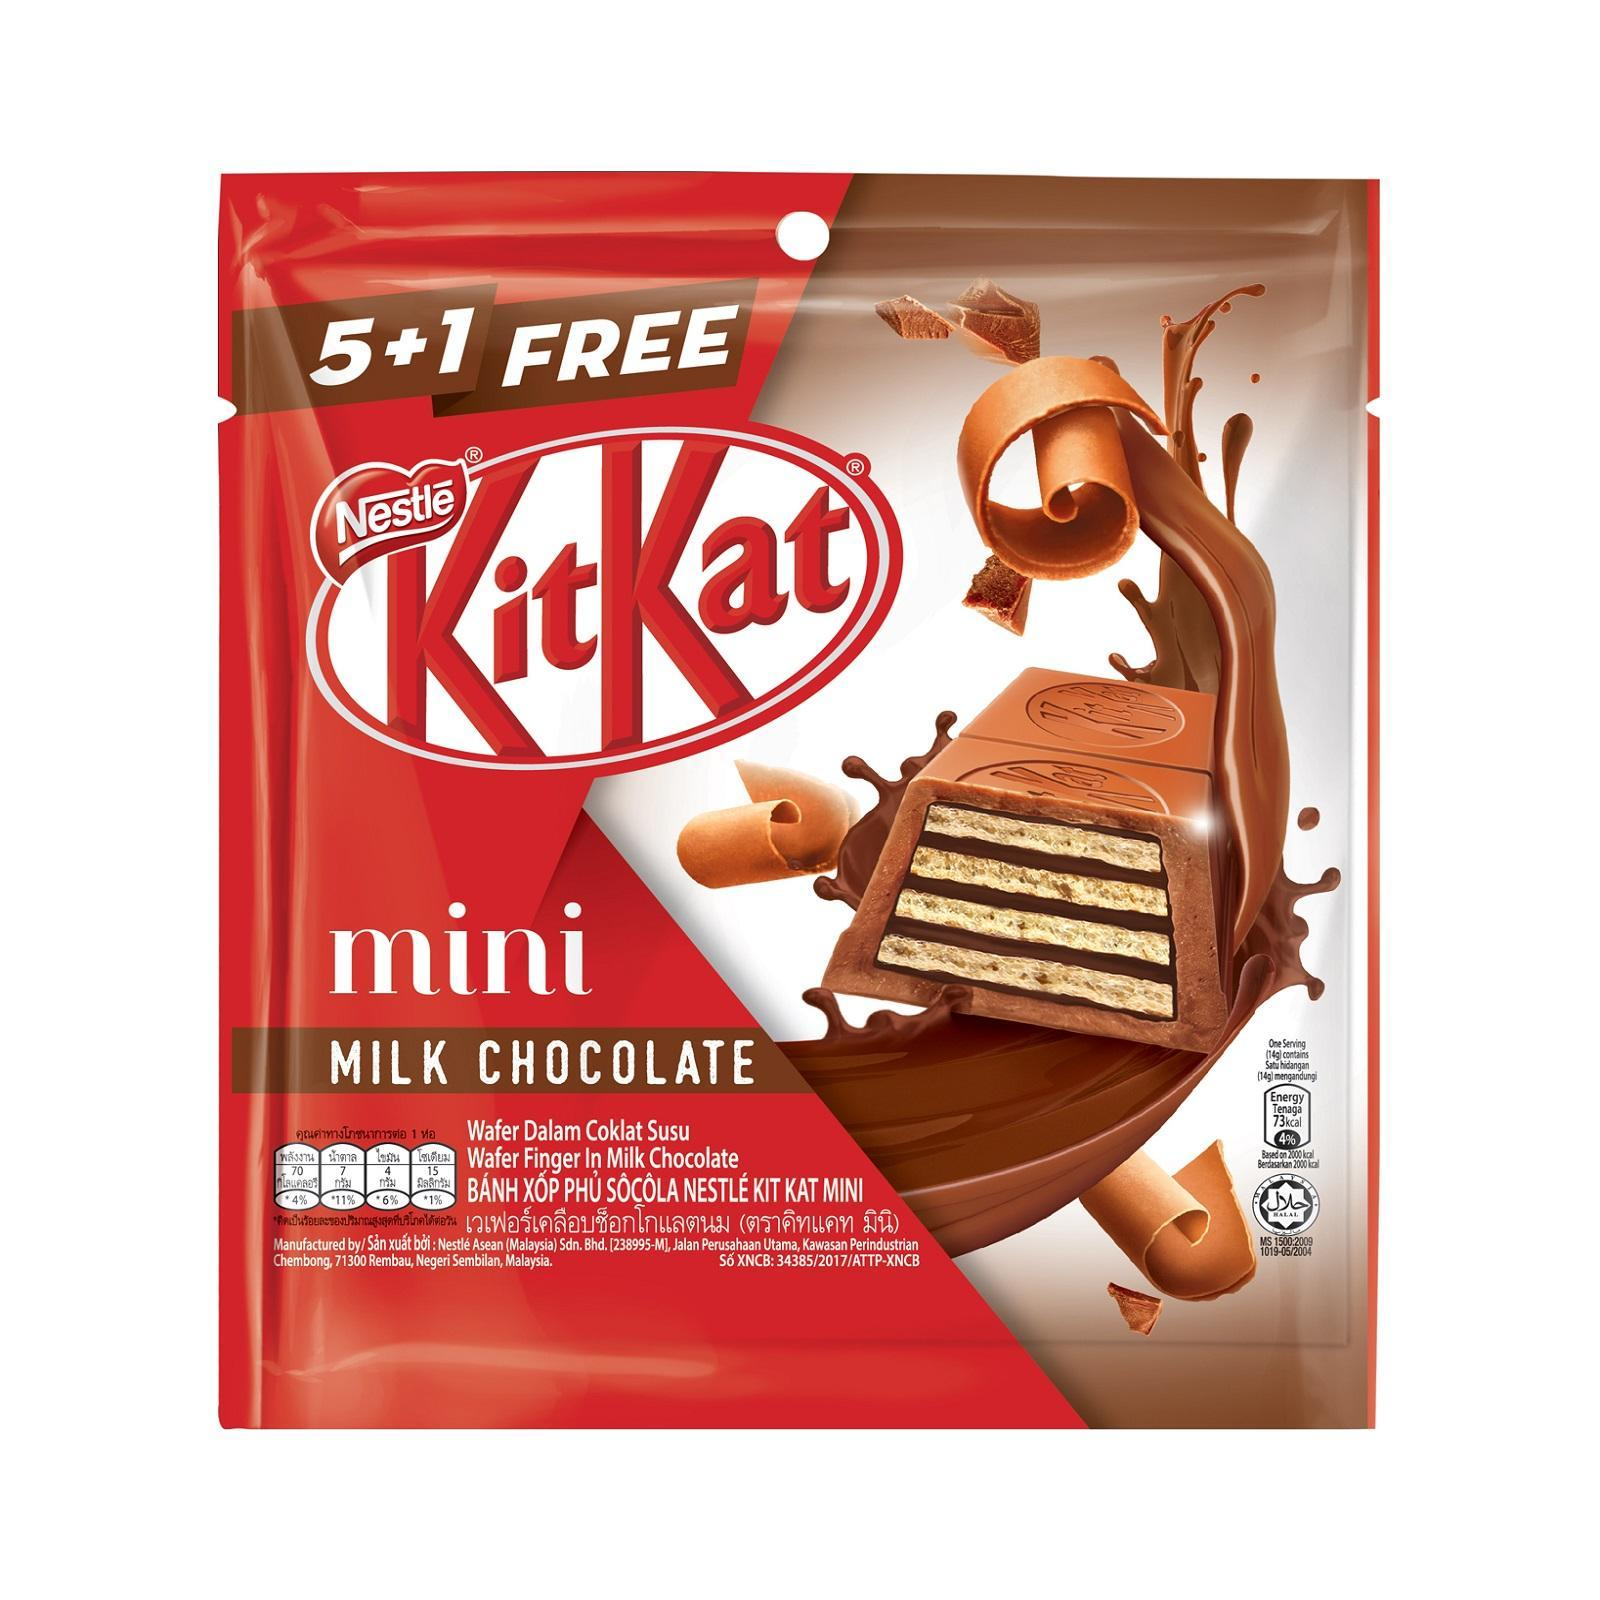 NESTLE KIT KAT Mini Milk Chocolate 5+1 Share Bag